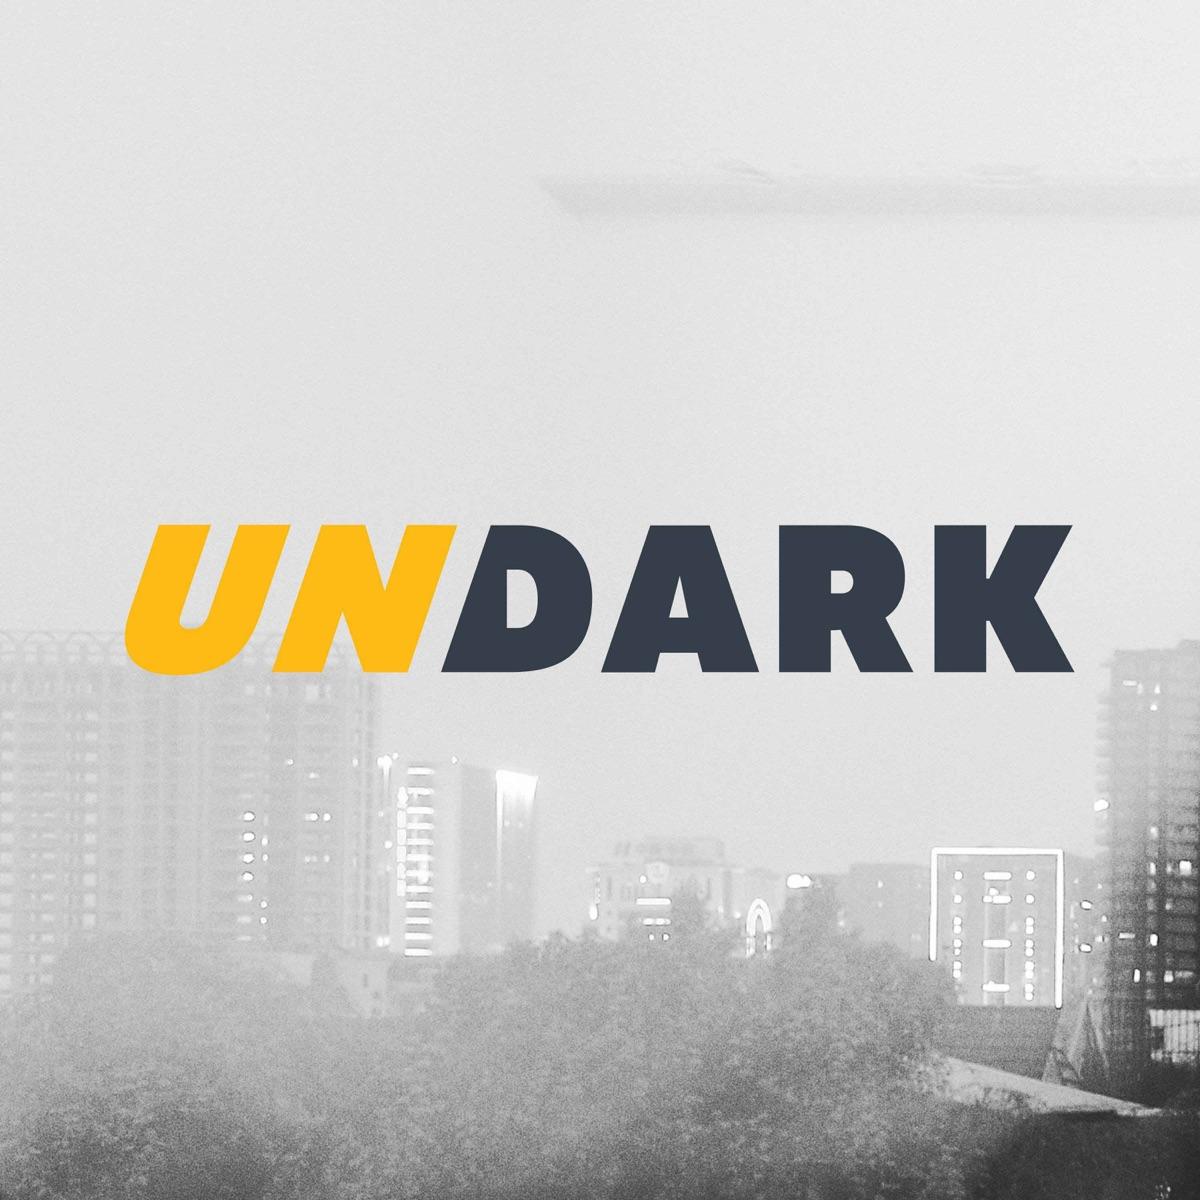 Undark: Truth, Beauty, Science